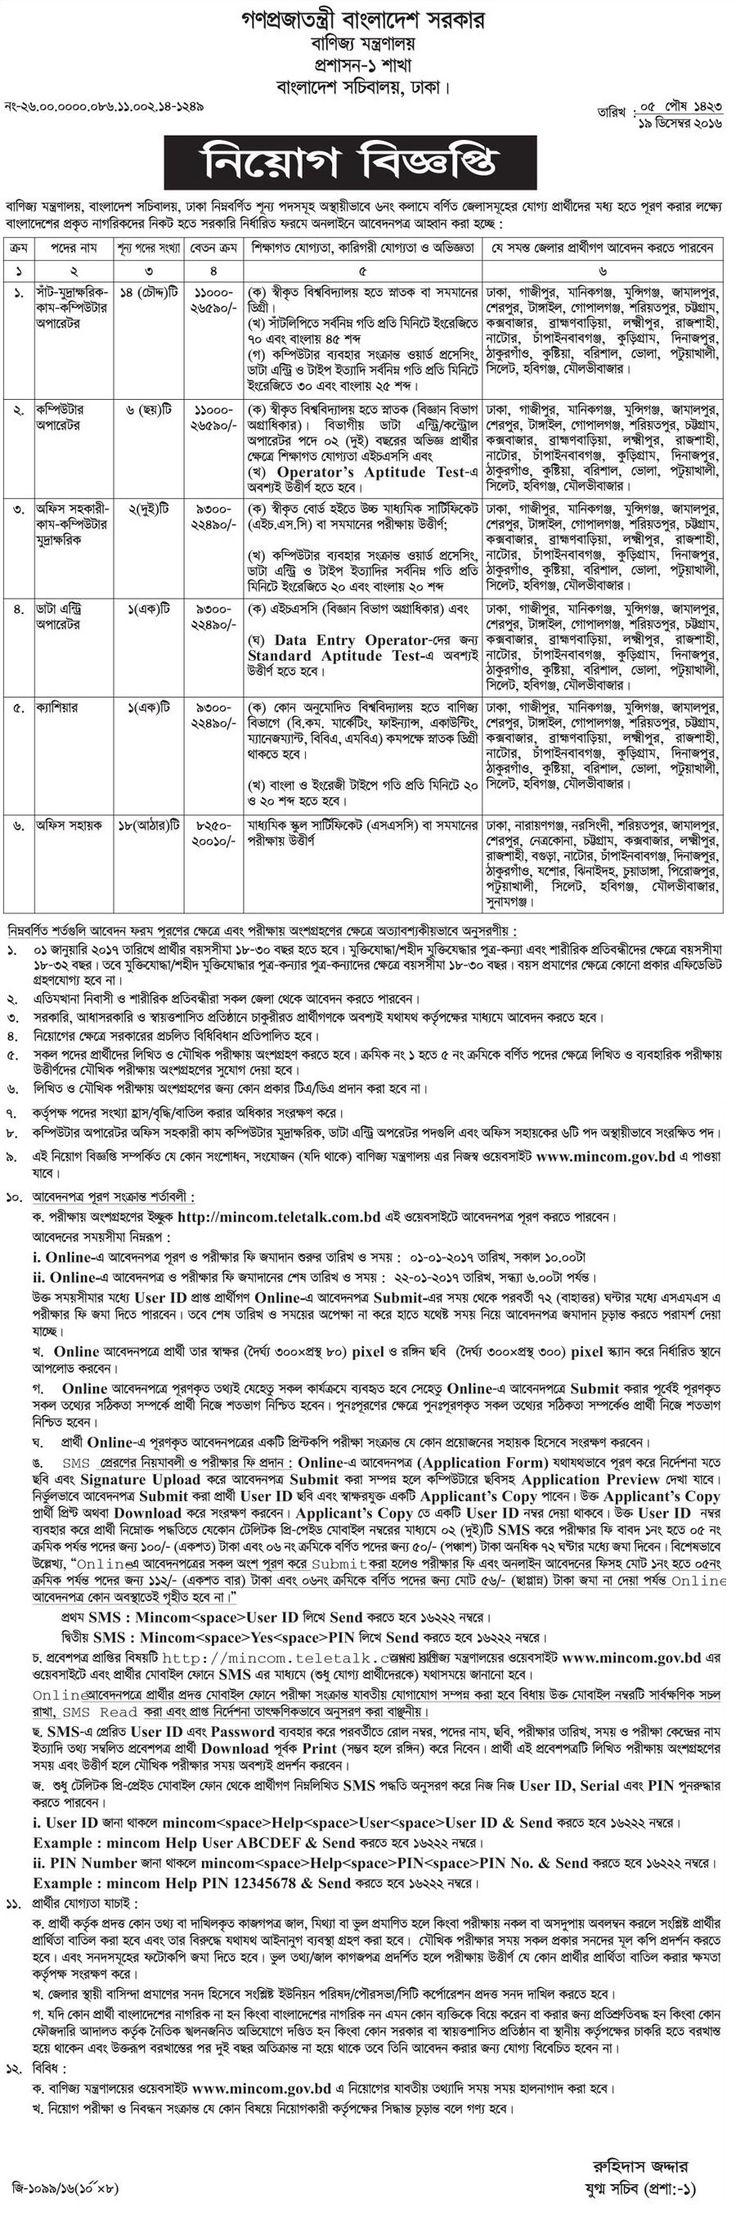 Ministry Of Commerce Job Circular  January 2017